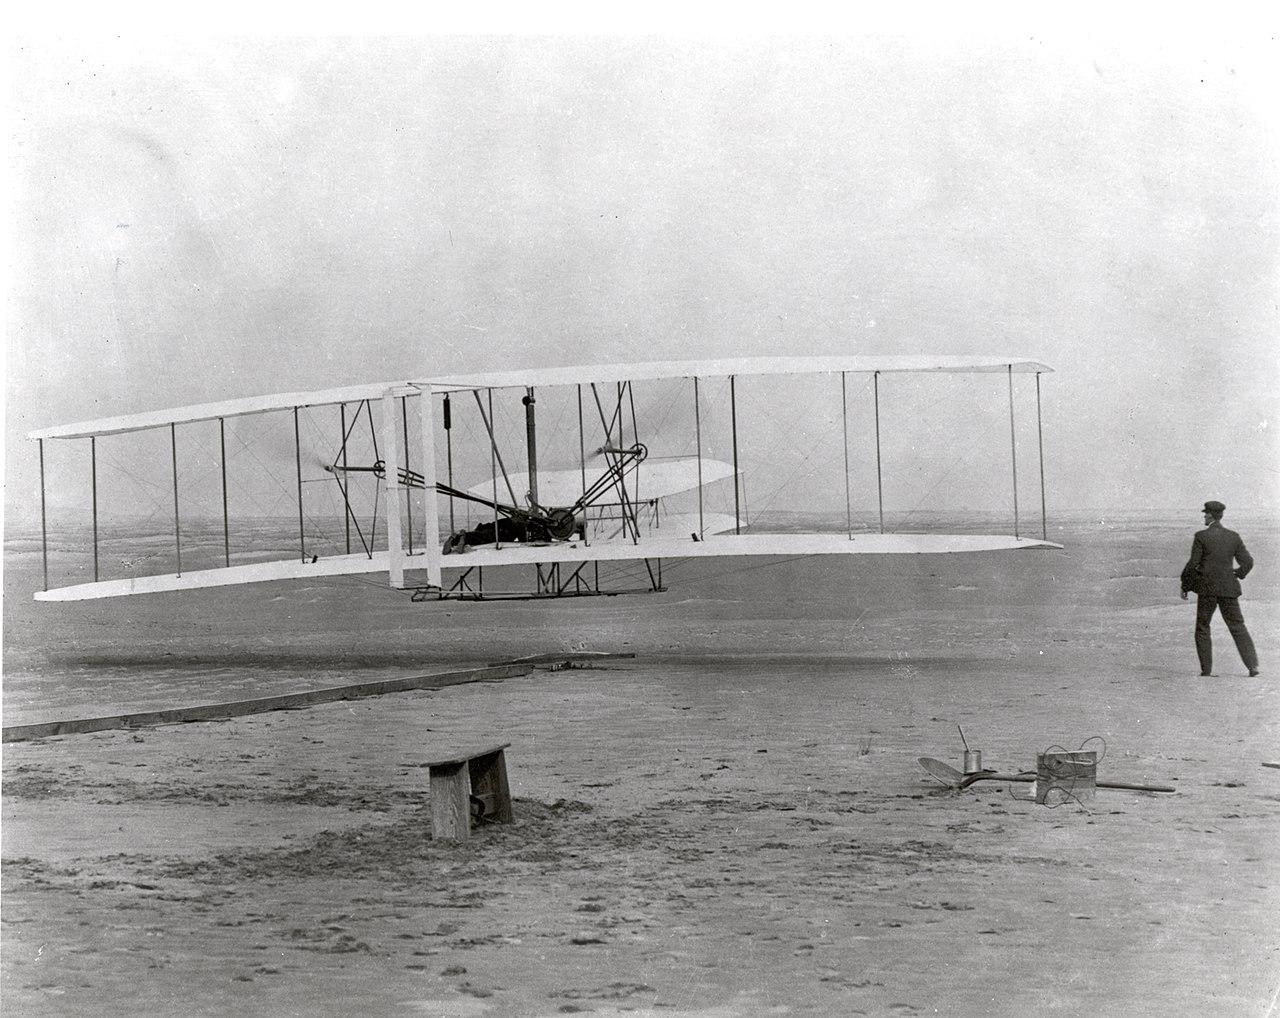 Landshut where Wright brothers the fist plane